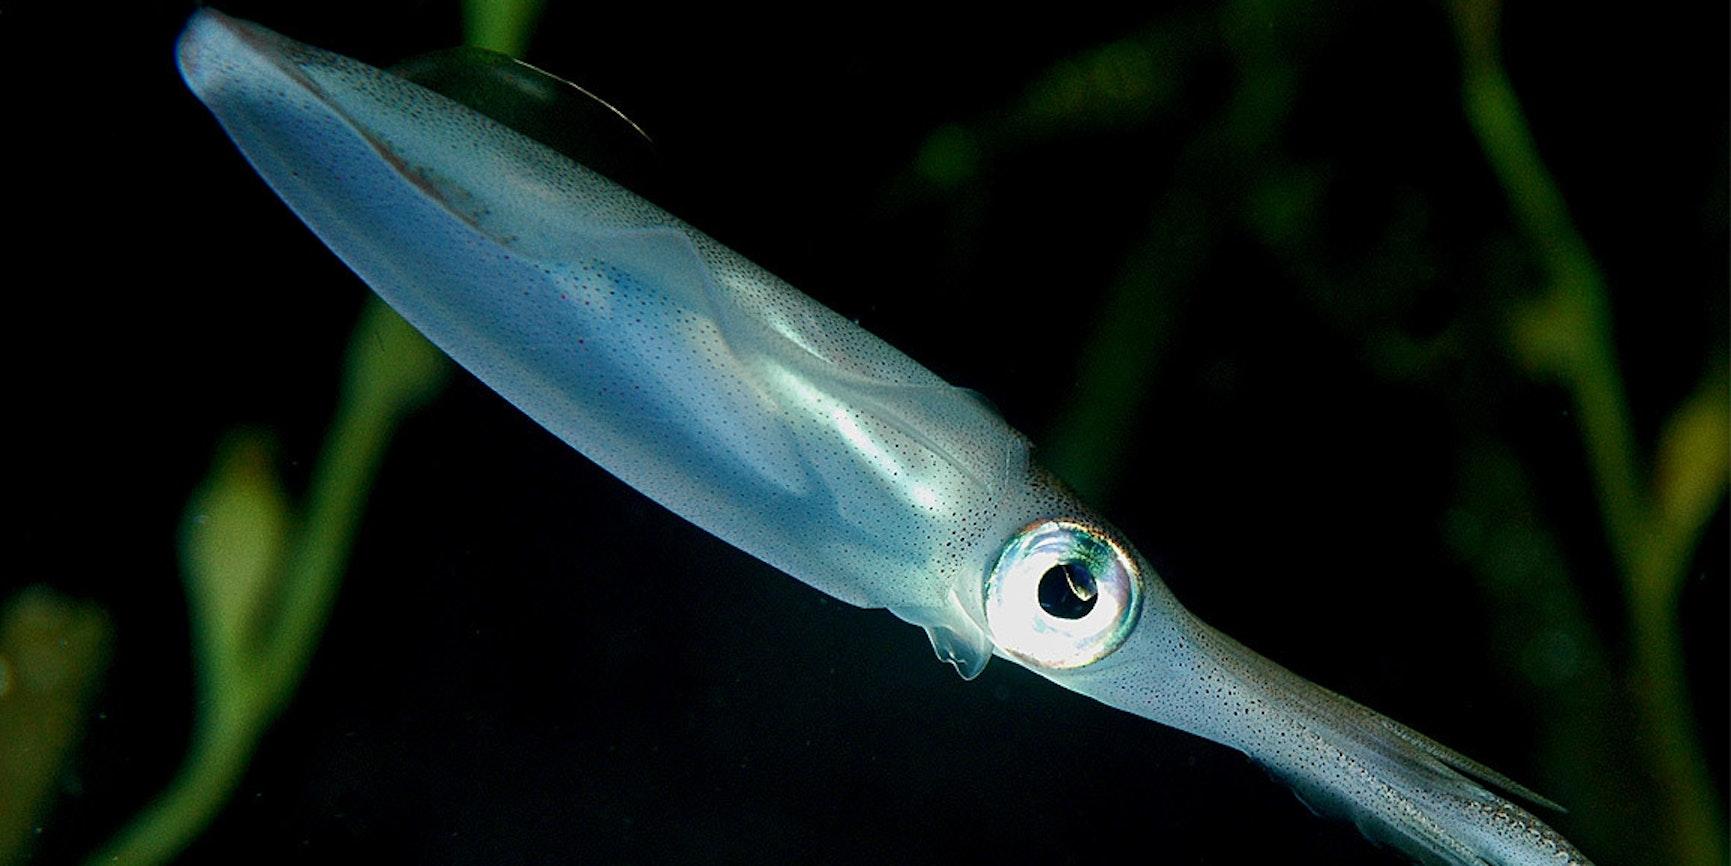 Penn State University scientists used squid ring teeth to make self-repairing fabrics